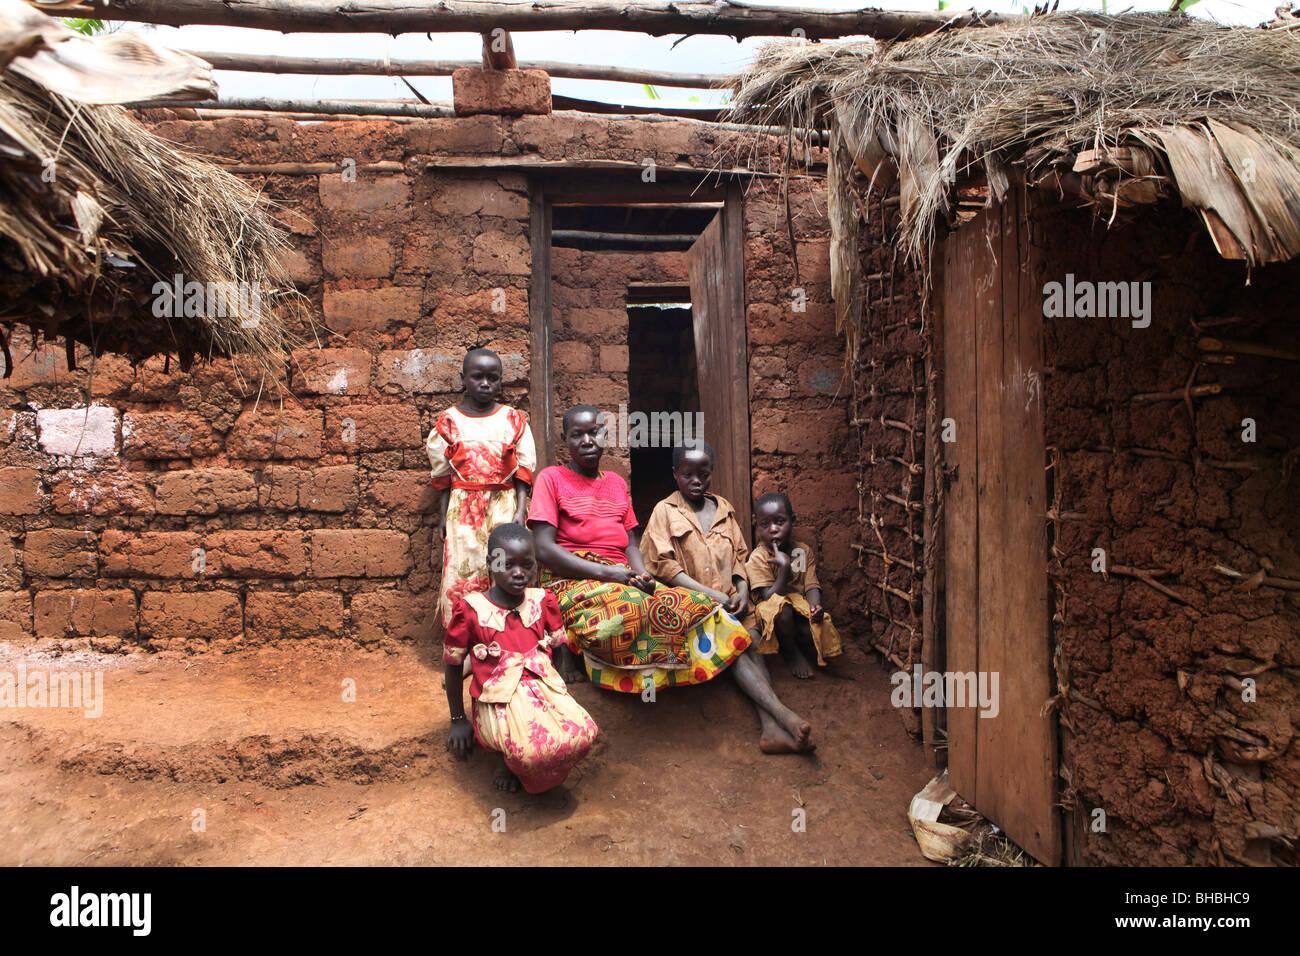 Africa african africans building building material burundi civil war conflict depressed depressing displaced displaced Stock Photo